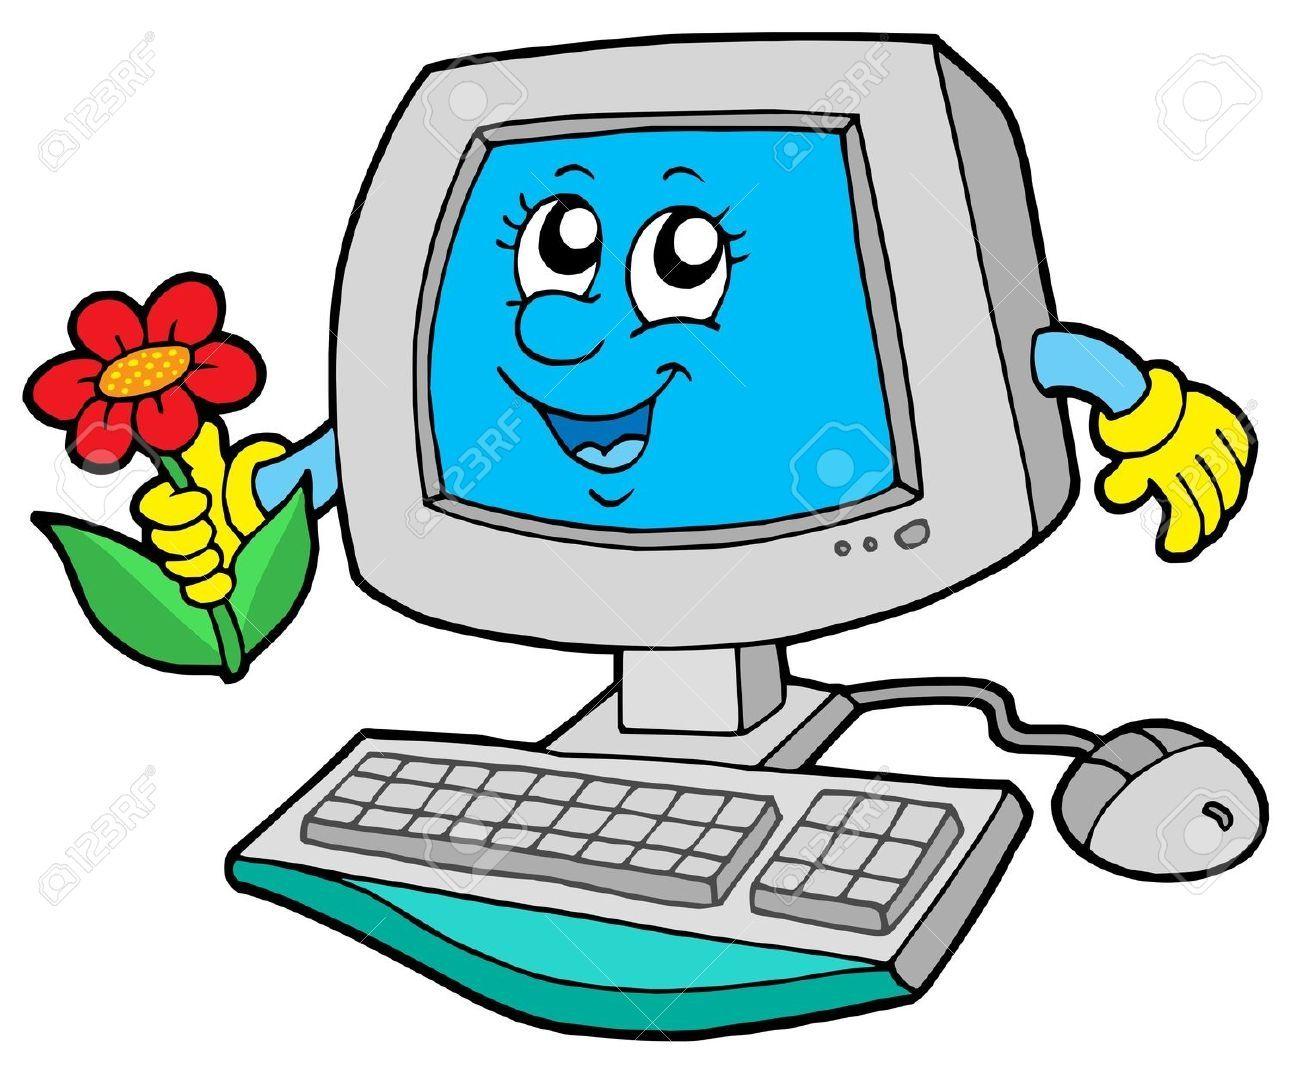 Computer Clipart Cartoon Clipart Collection Computer Cartoon Clip Art Cartoon Clip Art